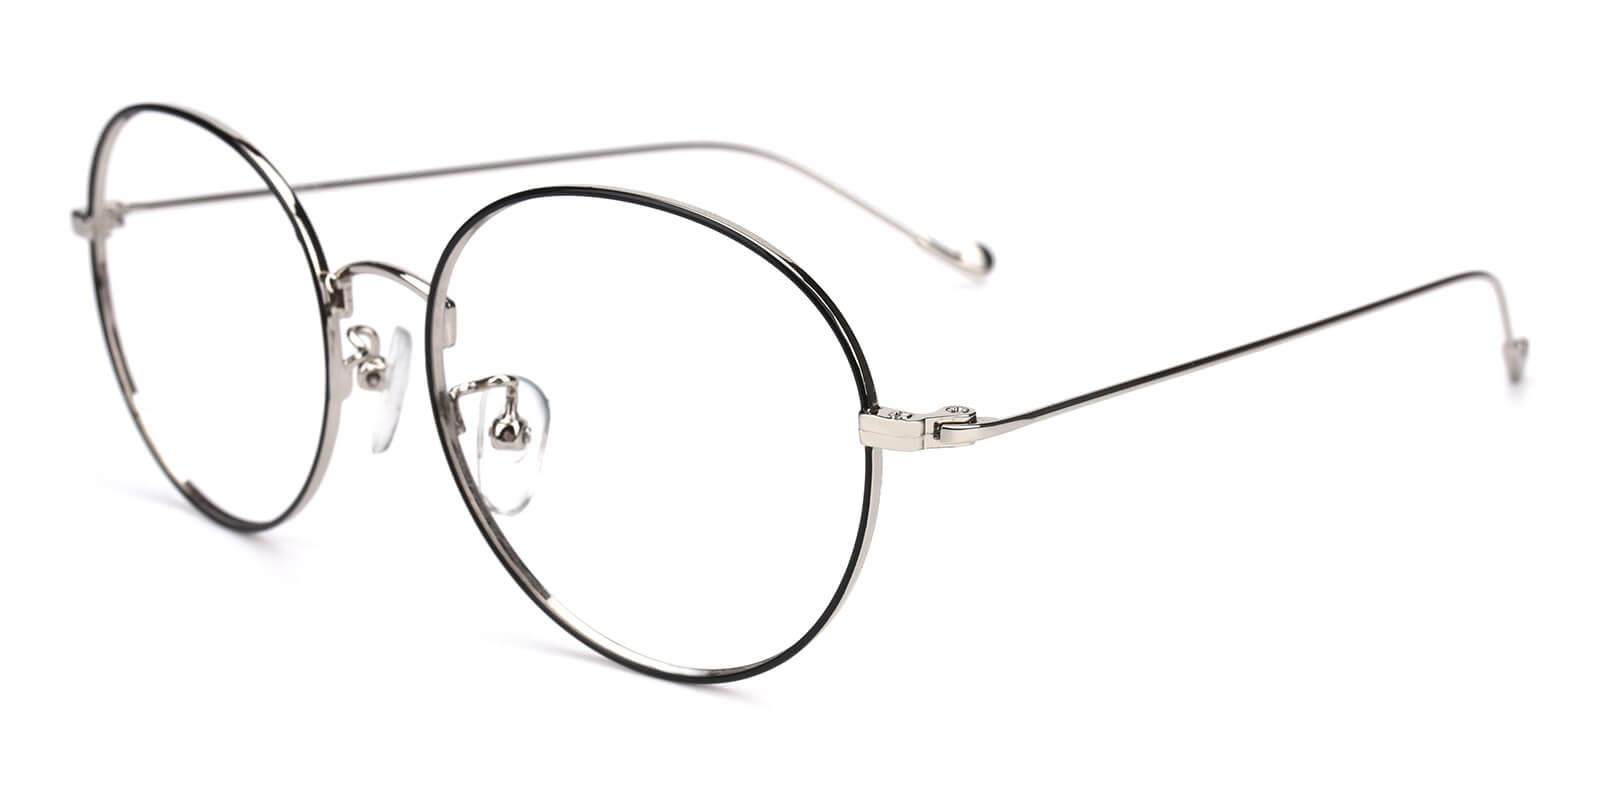 Jessy-Black-Round-Metal-Eyeglasses-additional1